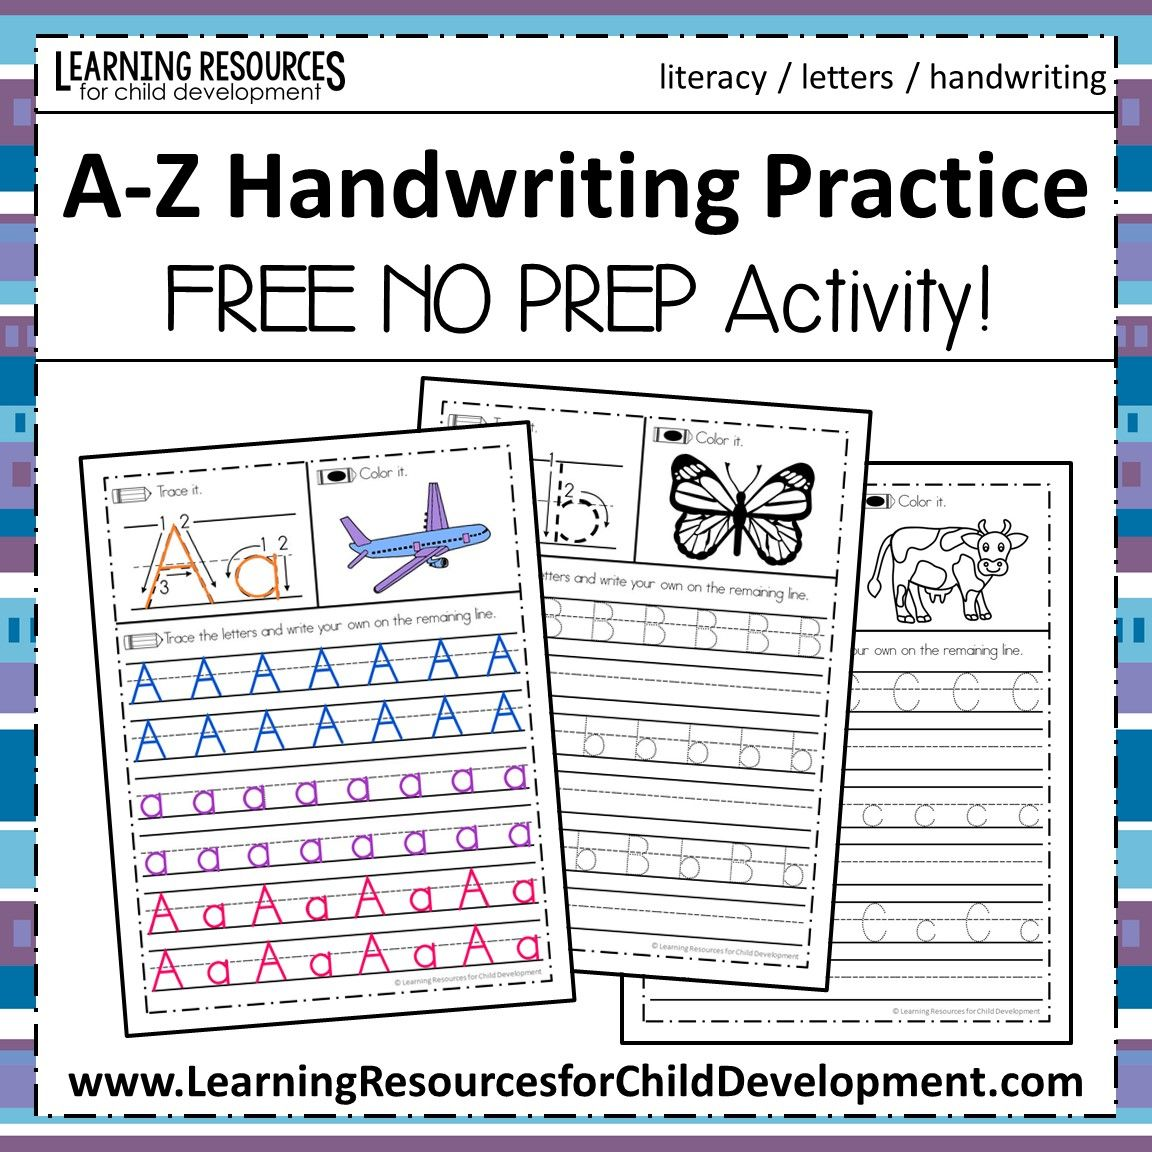 AZ Handwriting Practice Handwriting practice free